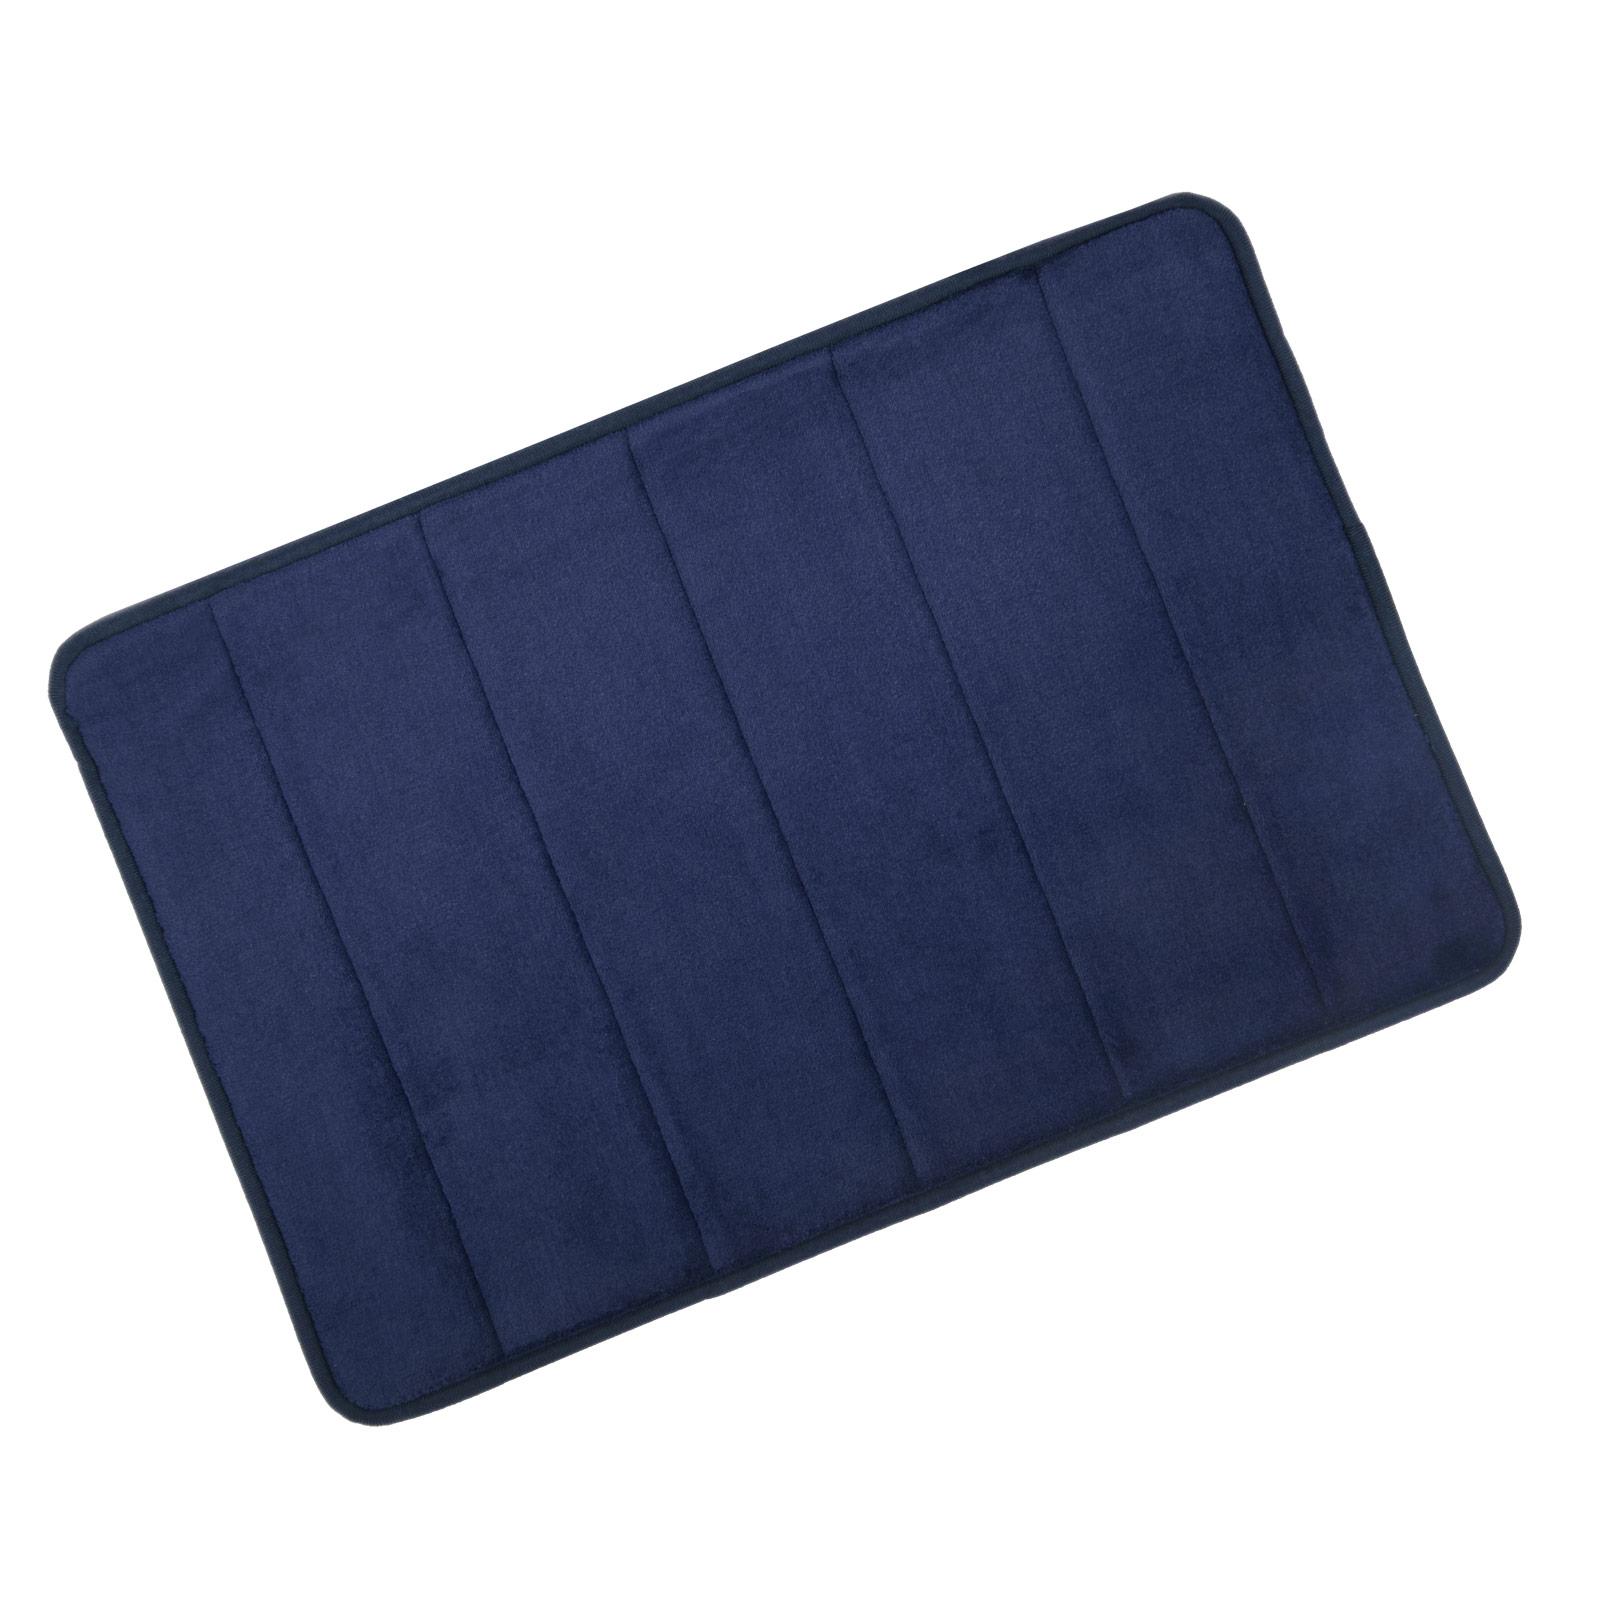 navy microfibre memory foam bath mat washable bathroom rug non slip 40x60cm ebay. Black Bedroom Furniture Sets. Home Design Ideas